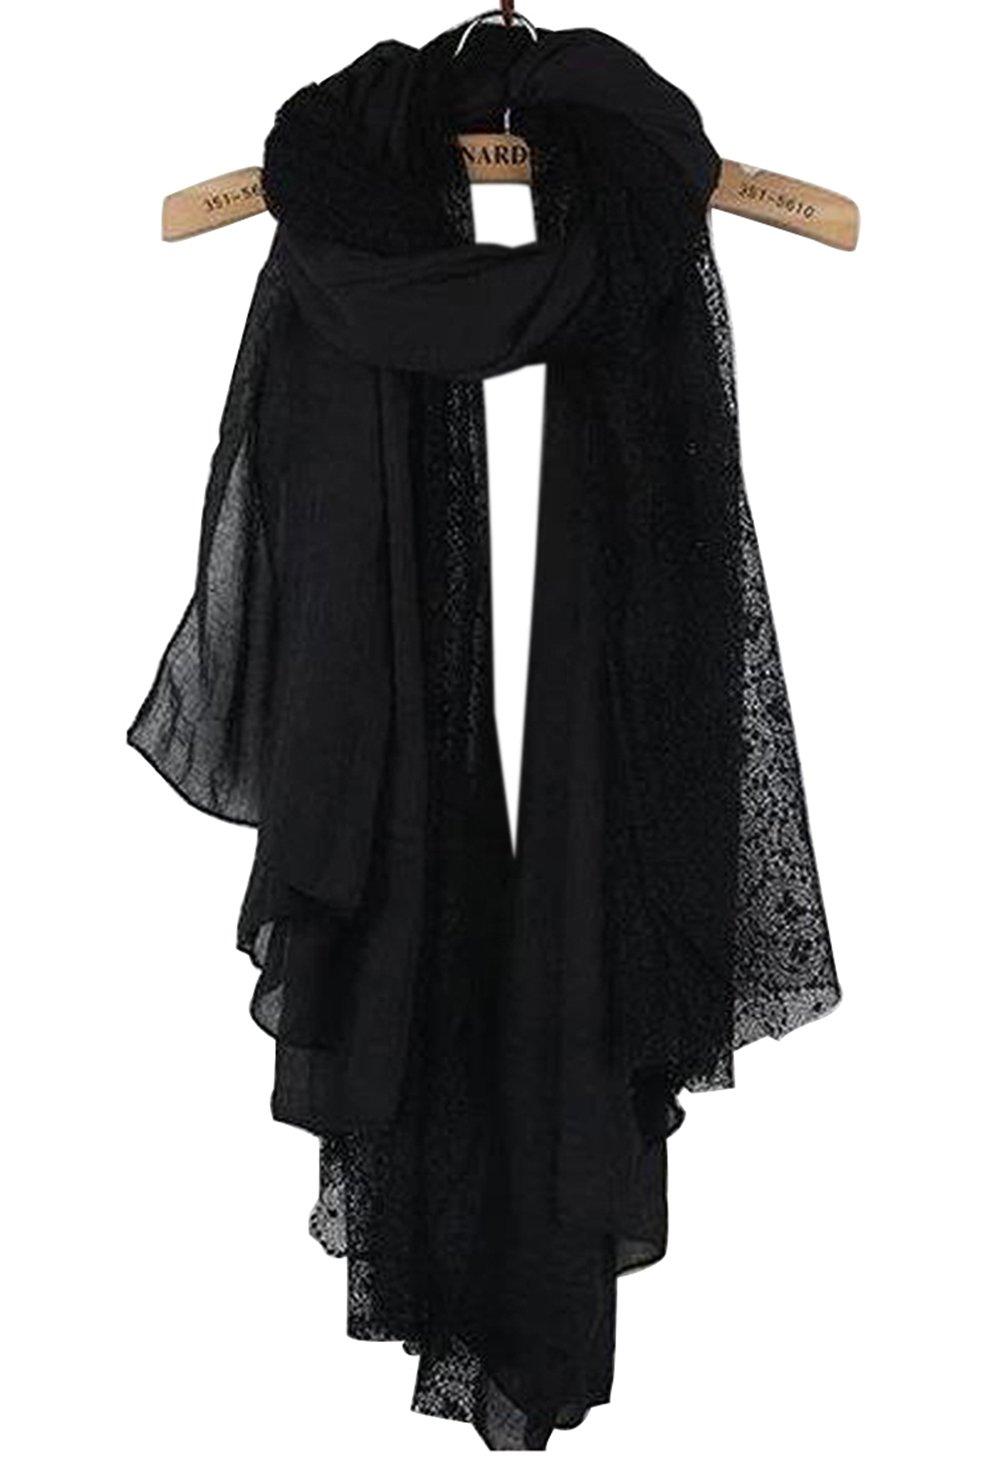 NOVAWO New Women Lady Ultra Long Gorgeous lace style Soft scarves shawl (Black)